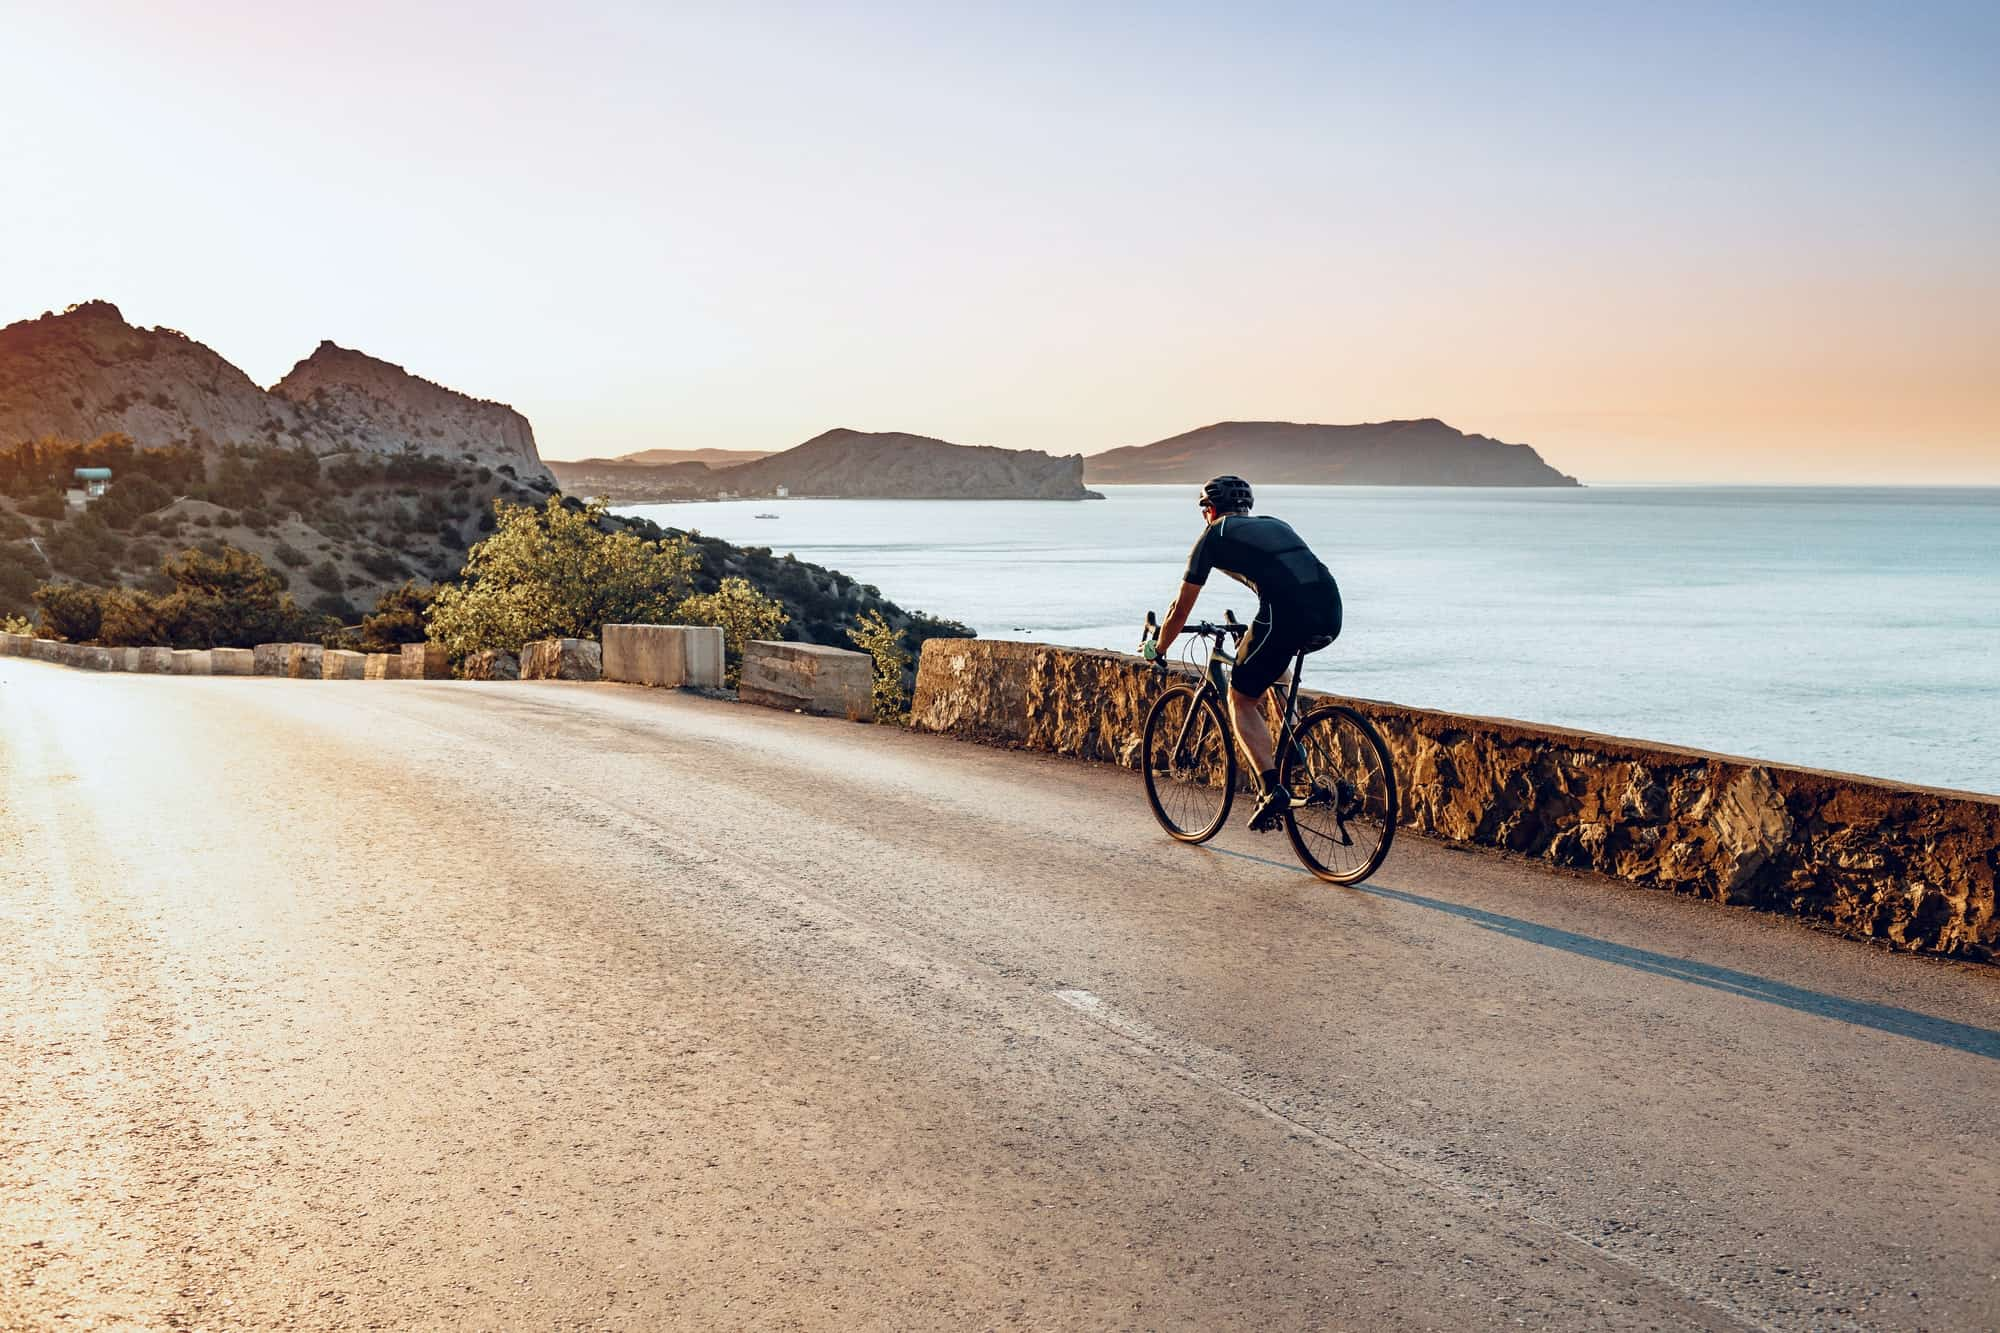 Cycling sport athlete man riding on coastal road